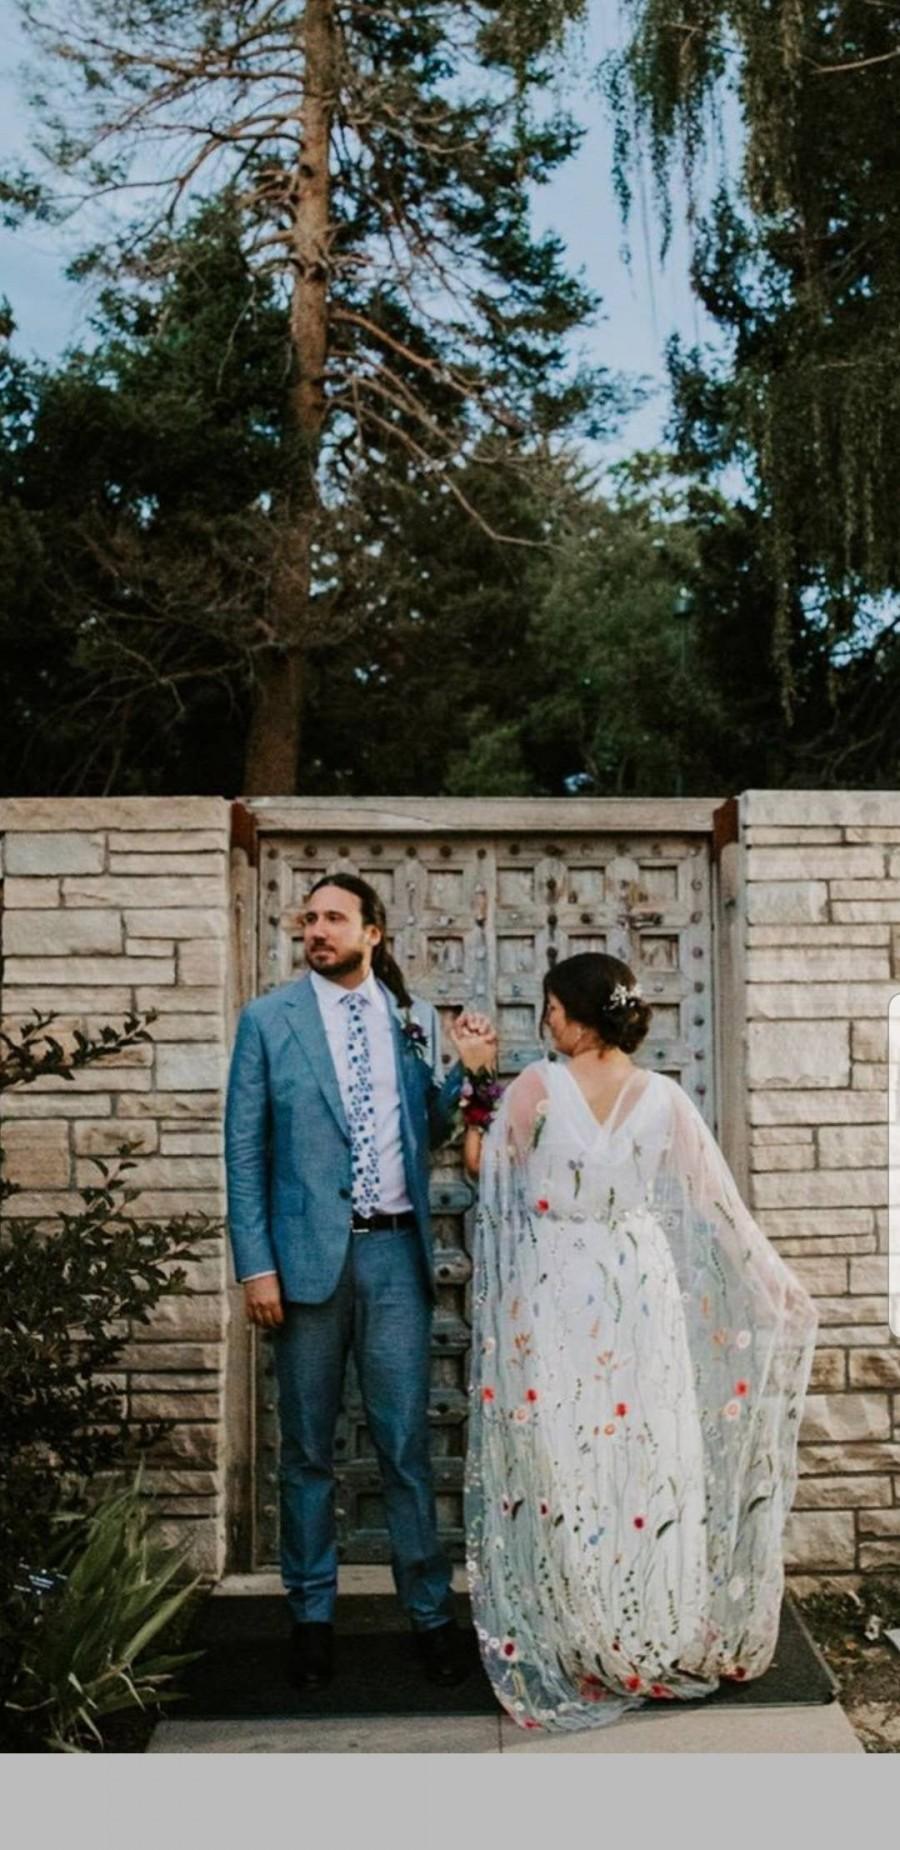 Mariage - Lennox Half Bridal Cape, Multi Colored Floral Embroidered Off-White Bridal Cape, White Cape, Chapel Length Veil